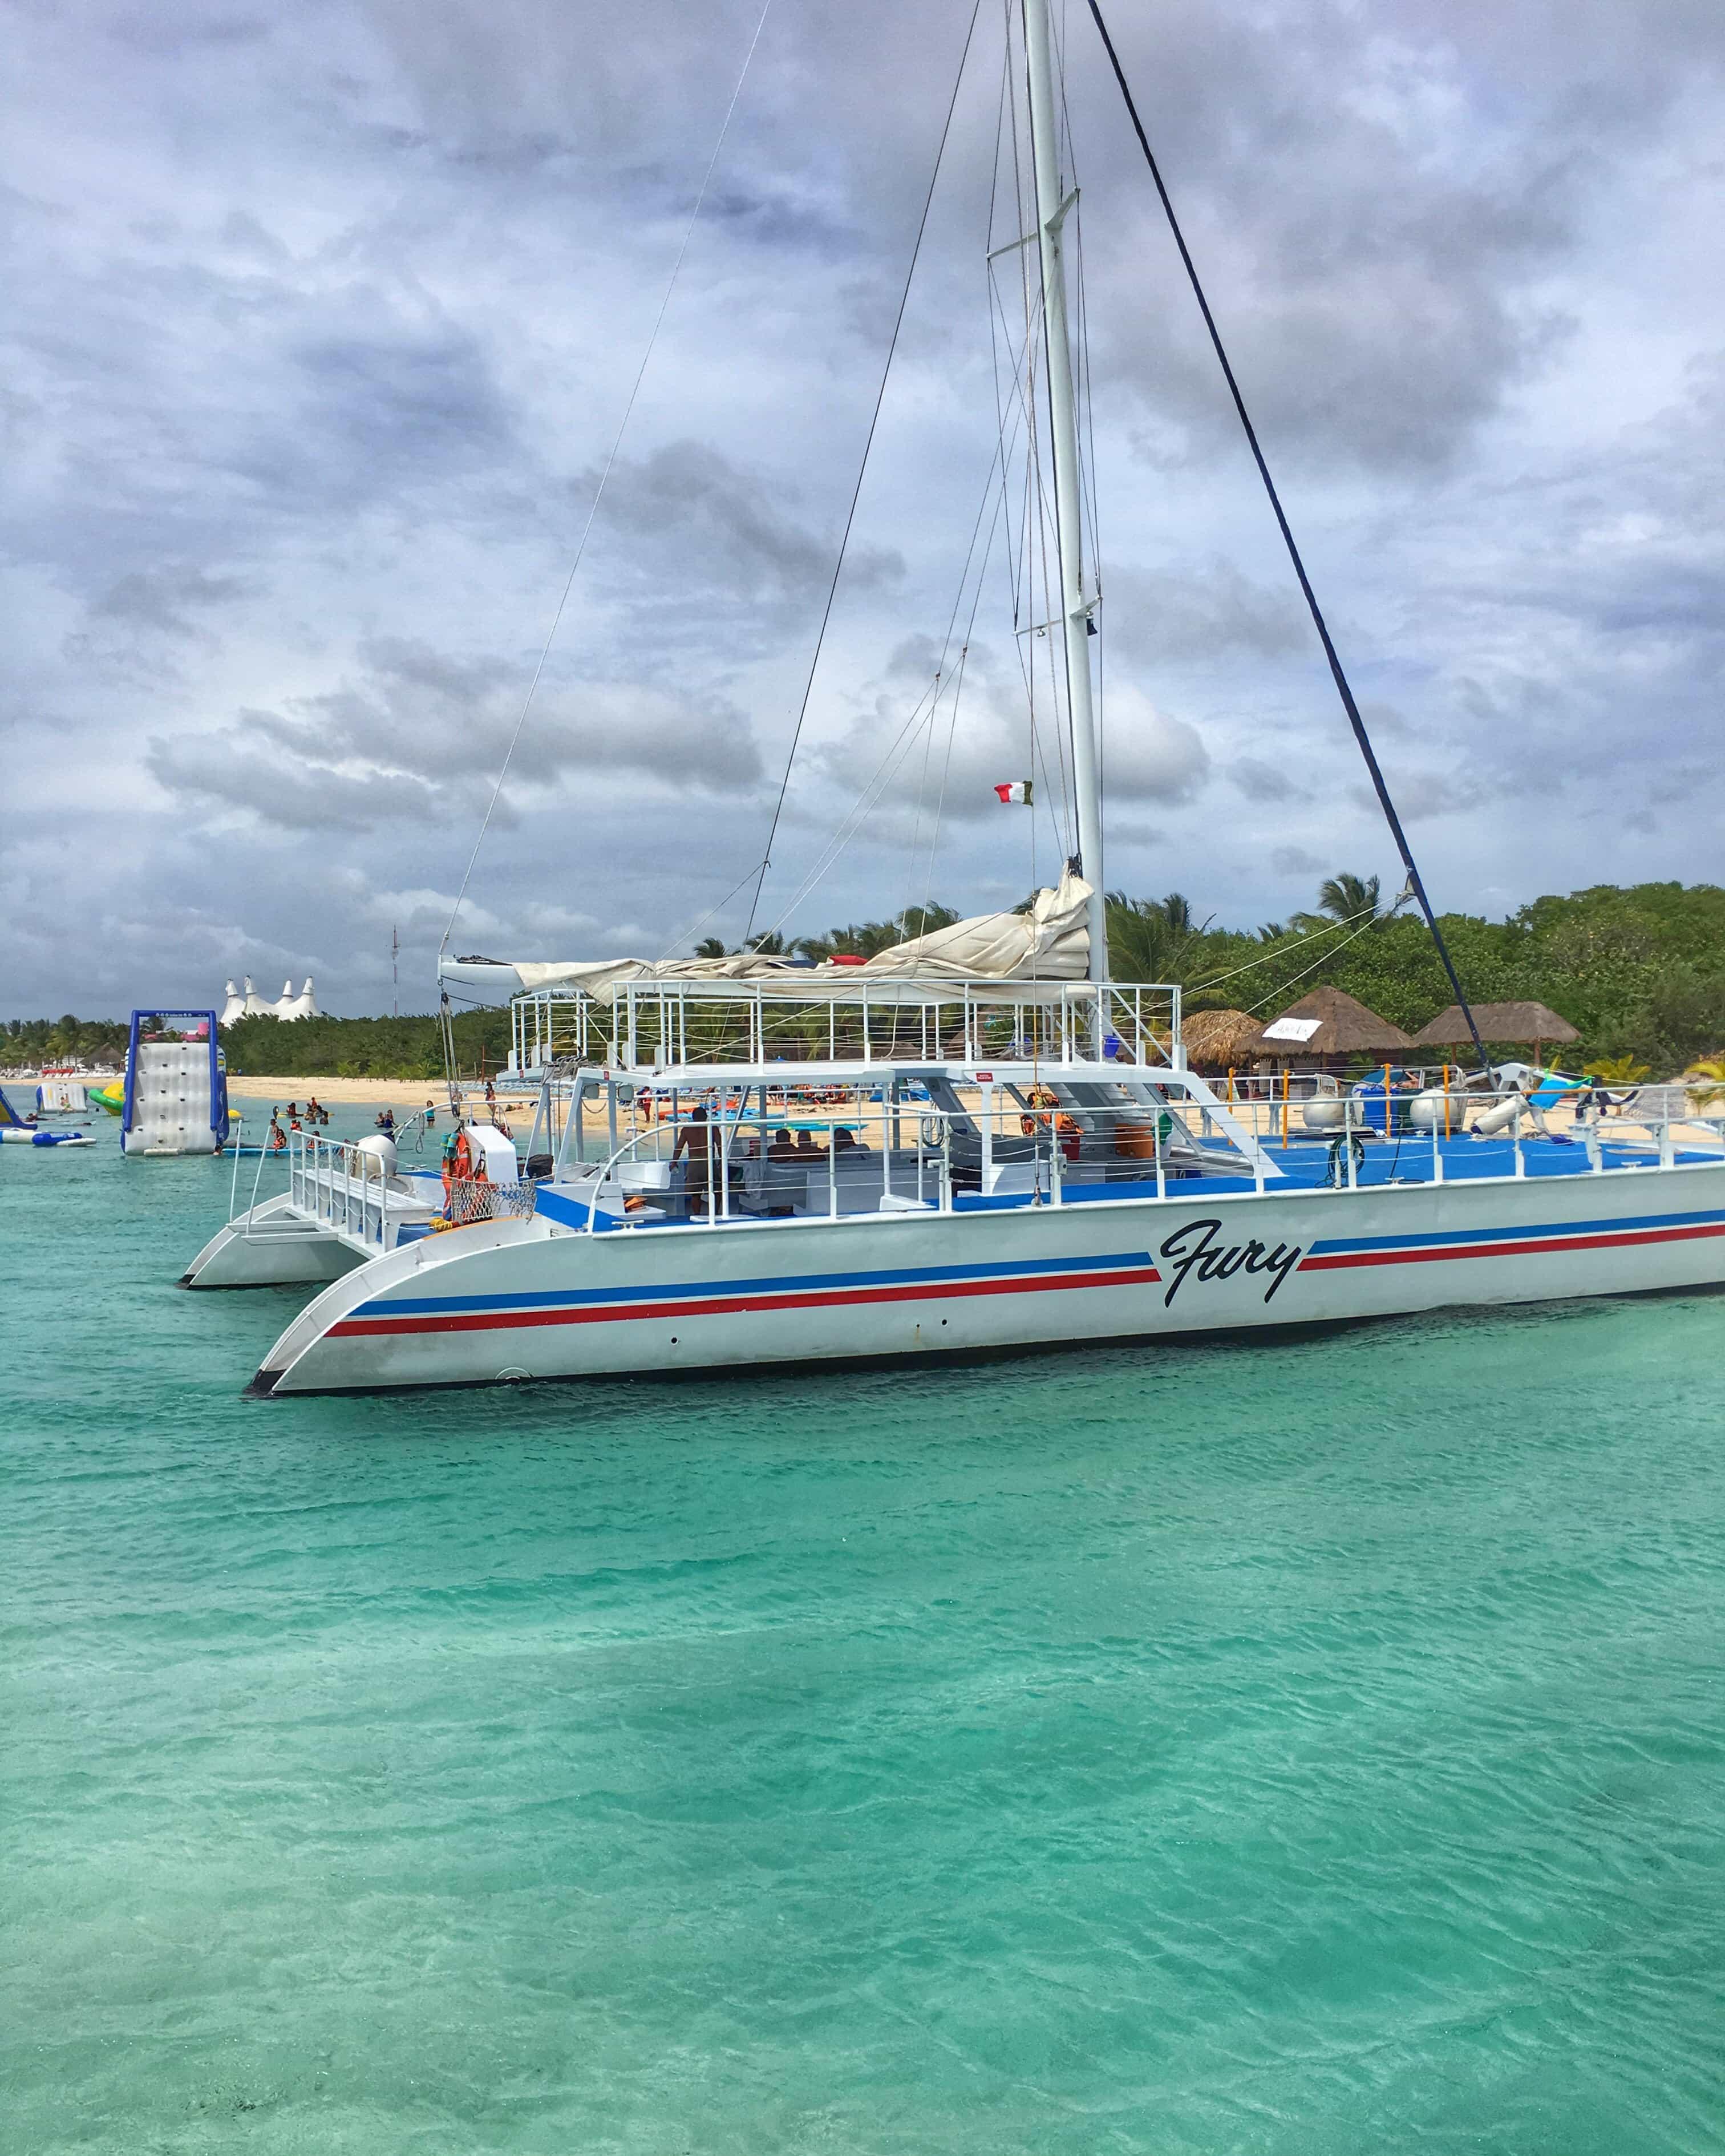 9 Reasons Cruising the Carnival Magic Good for Adults - Cozumel Catamaran